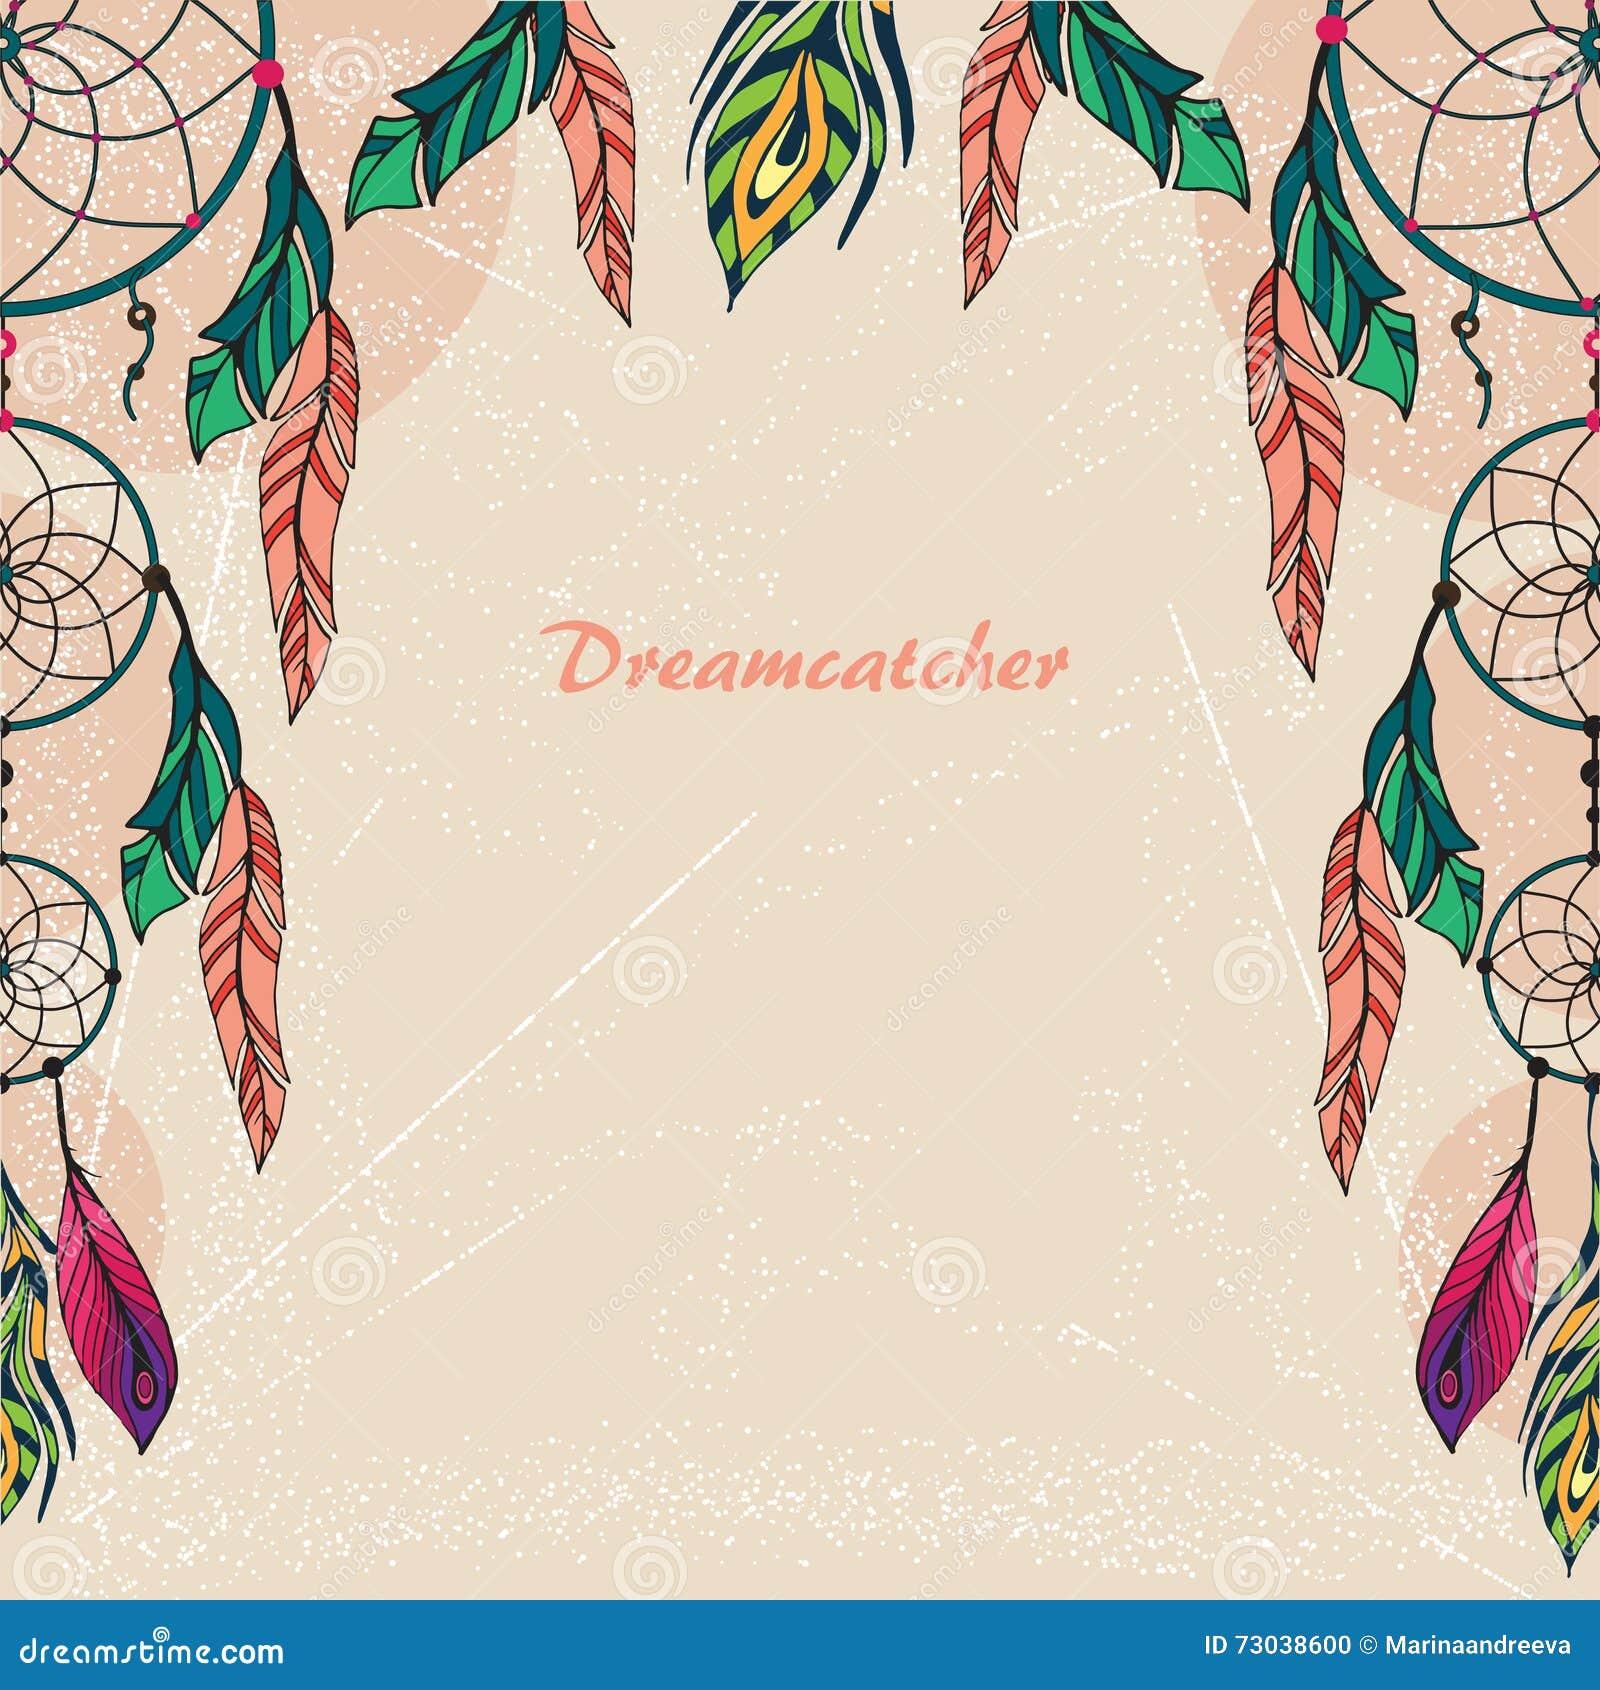 Color art dreamcatcher - Royalty Free Vector Download Dream Catcher Color